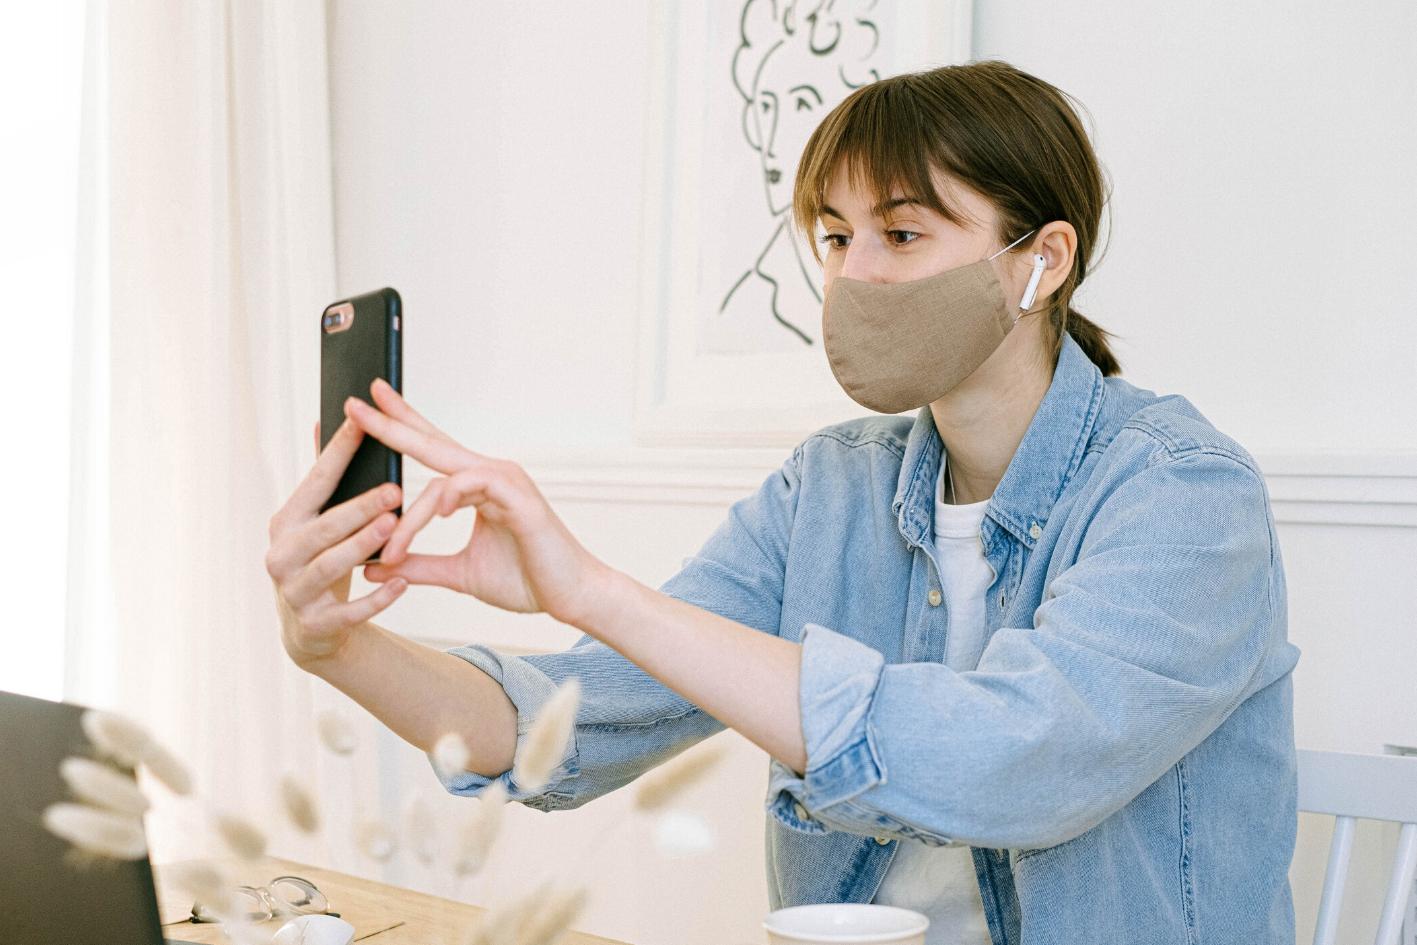 Mujer con tababocas usando su celular